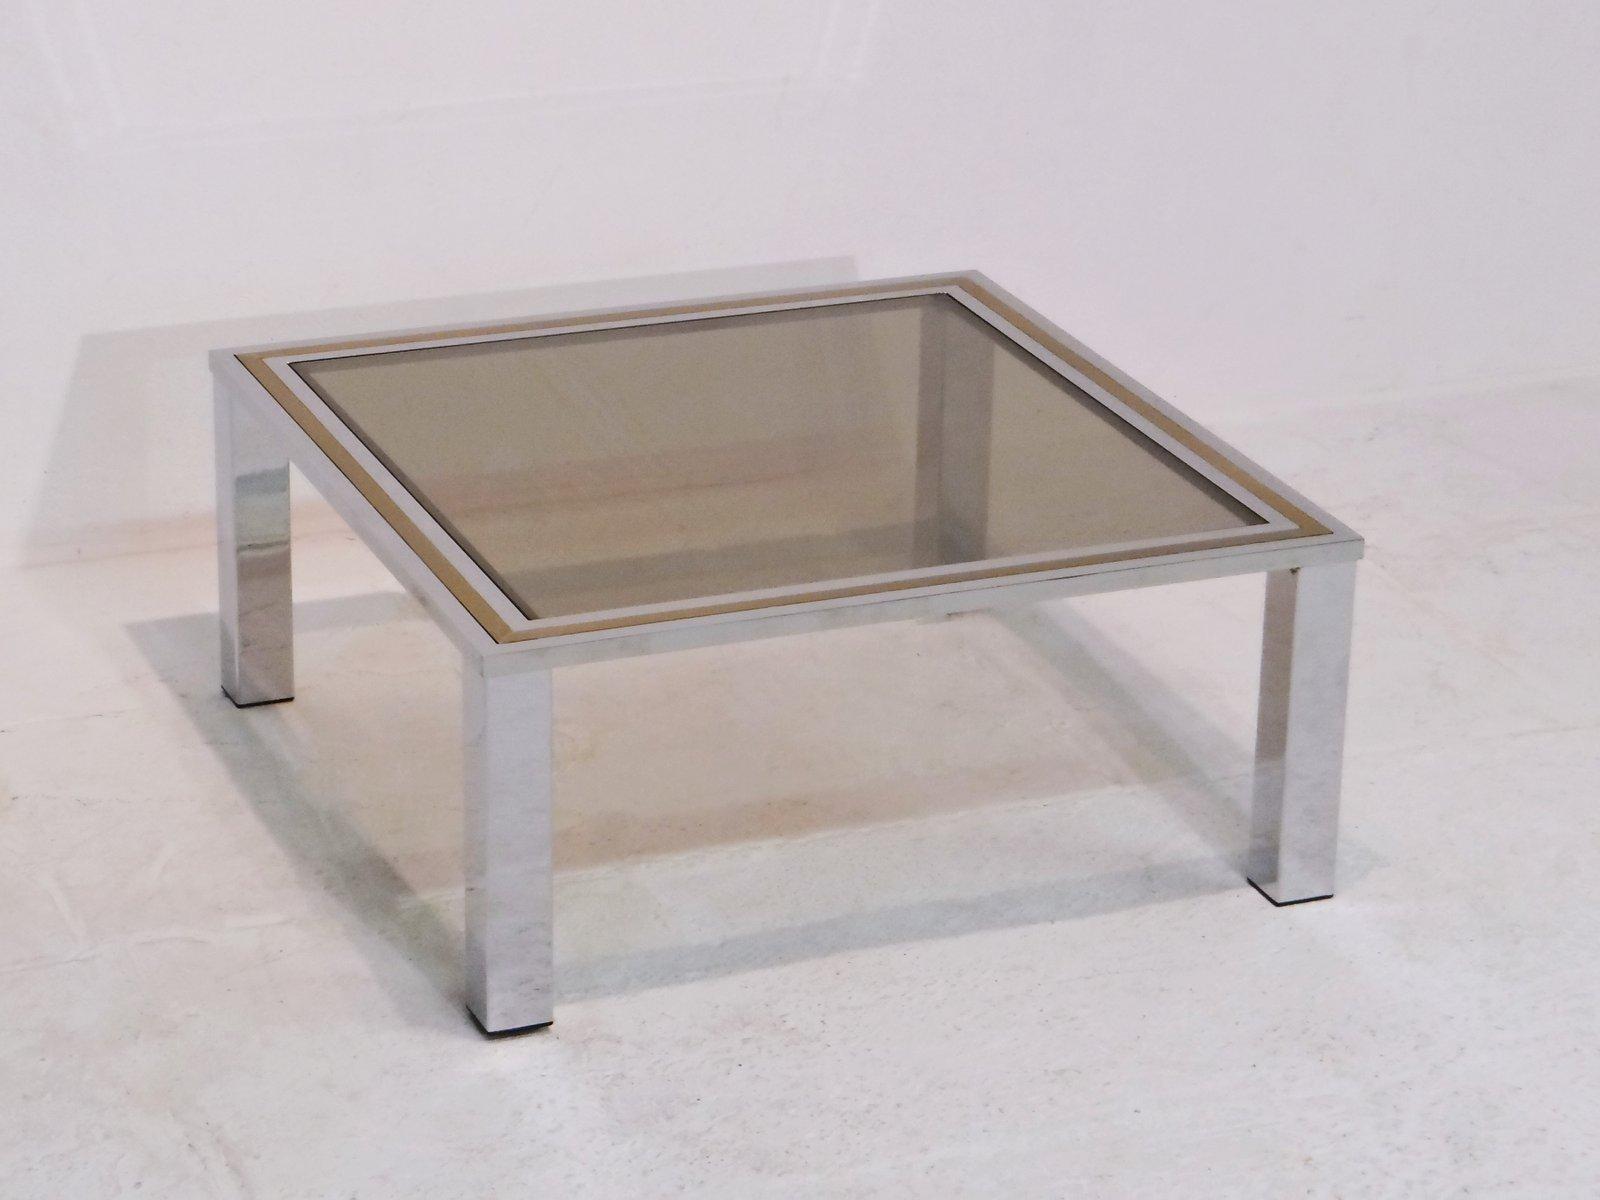 table basse vintage avec dessus en verre fum en vente sur pamono. Black Bedroom Furniture Sets. Home Design Ideas